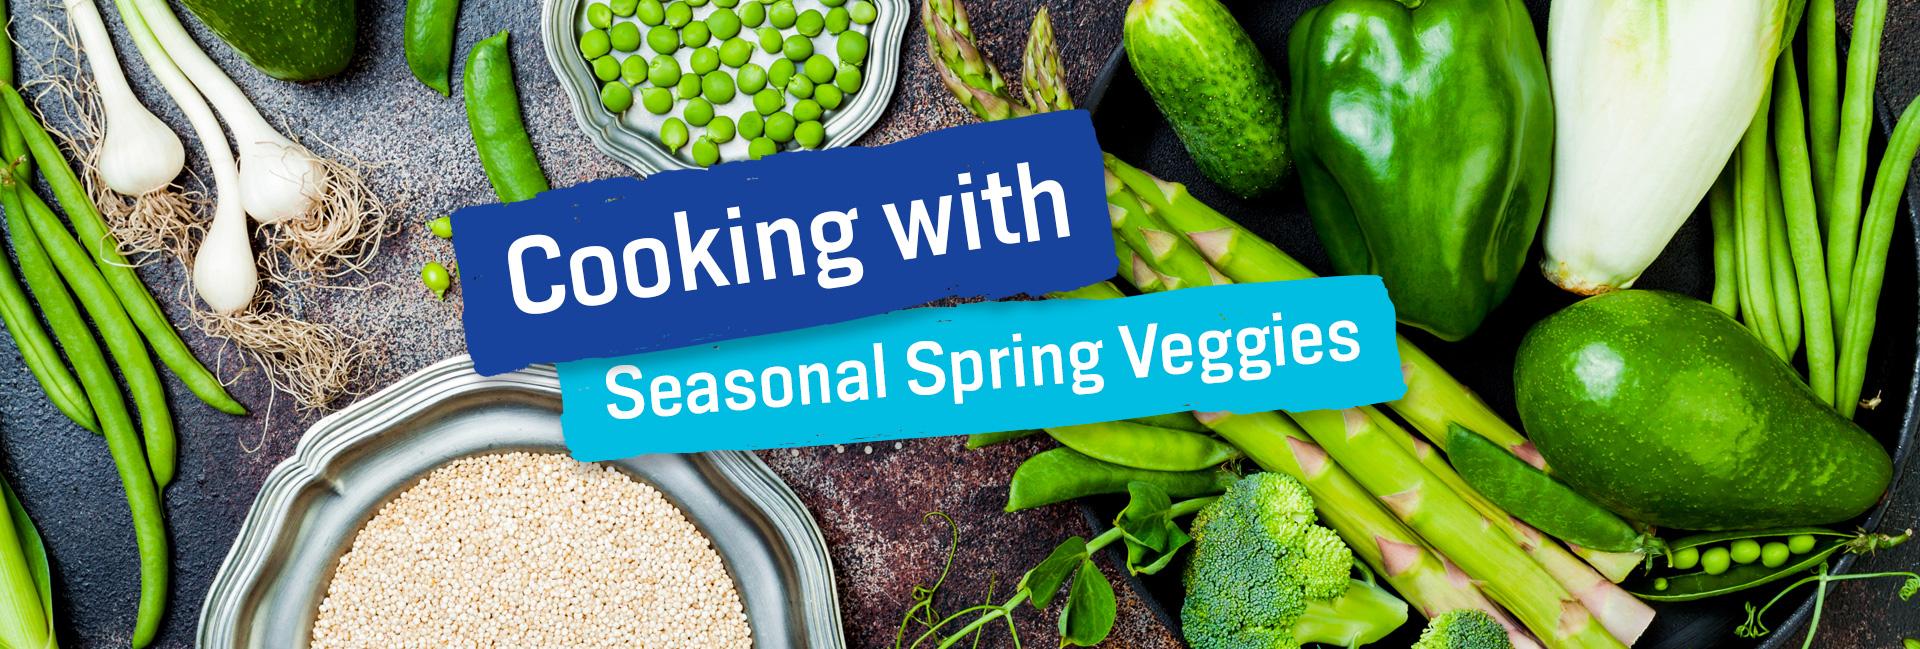 Seasonal Spring Veggies